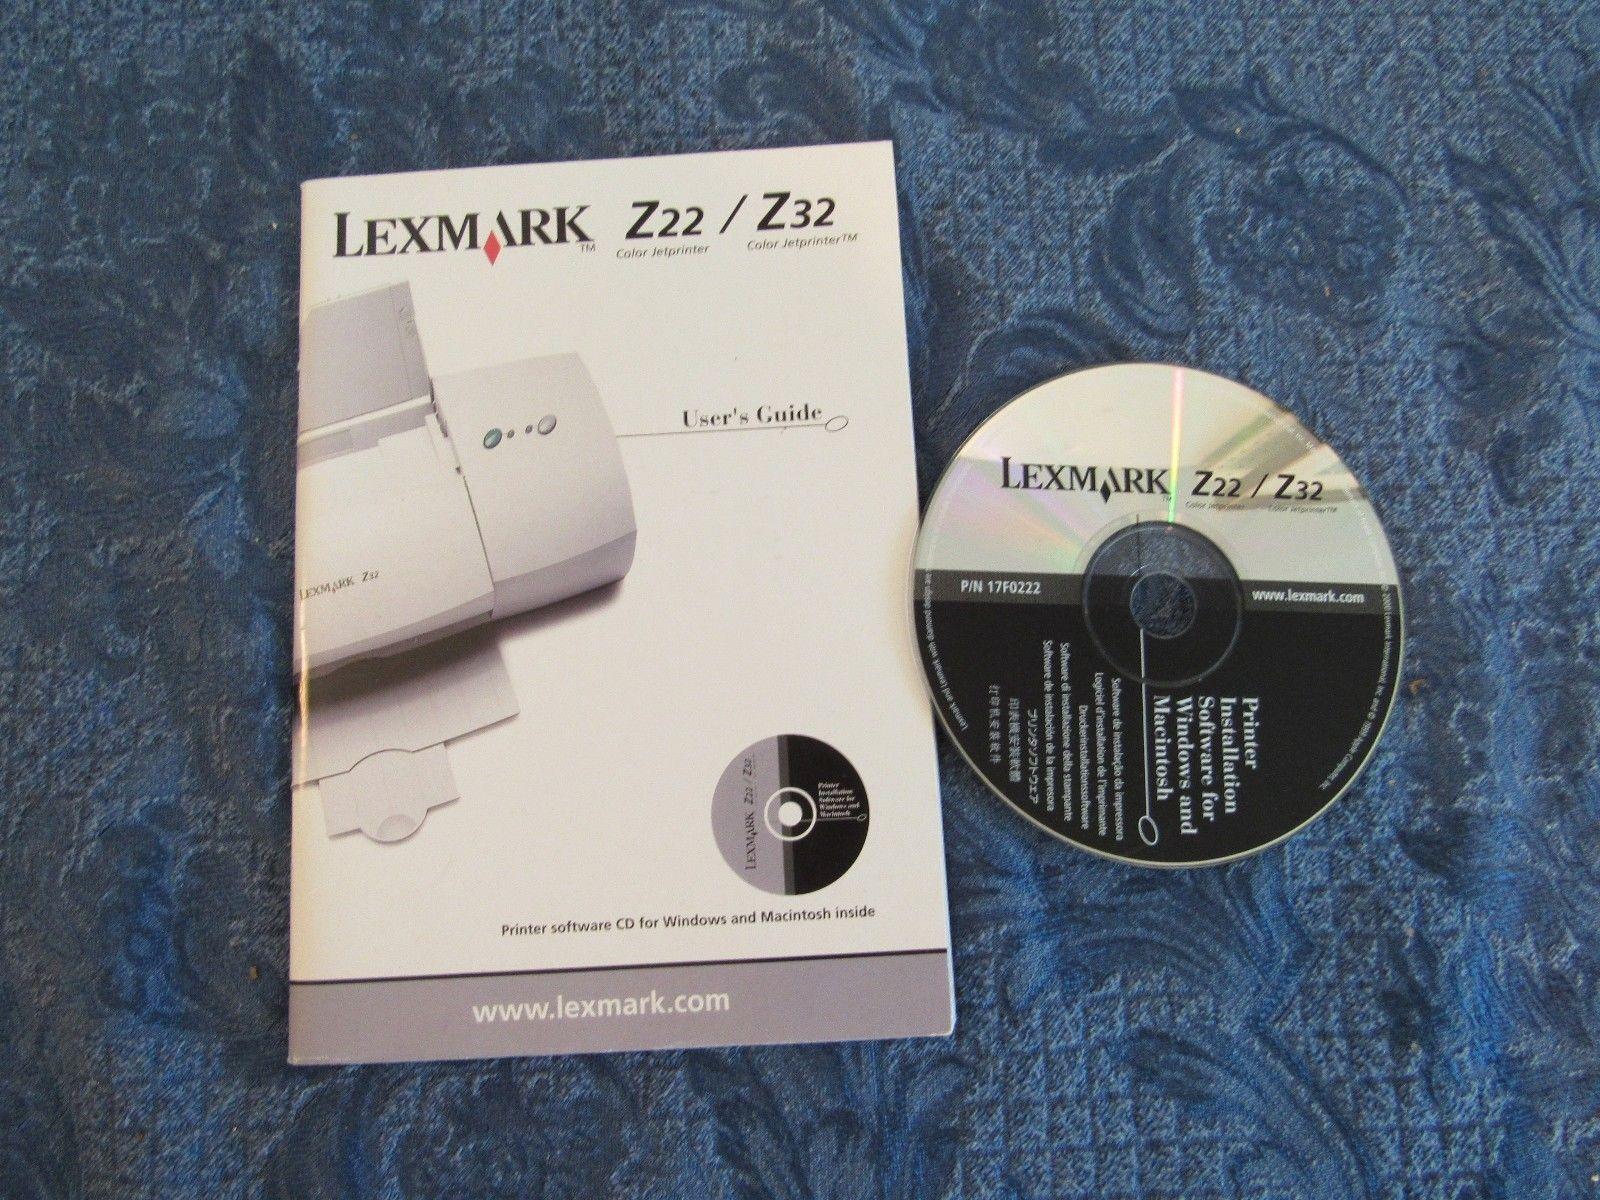 Lexmark Z22, Z32 Driver Software & User Guide For Windows & Mac